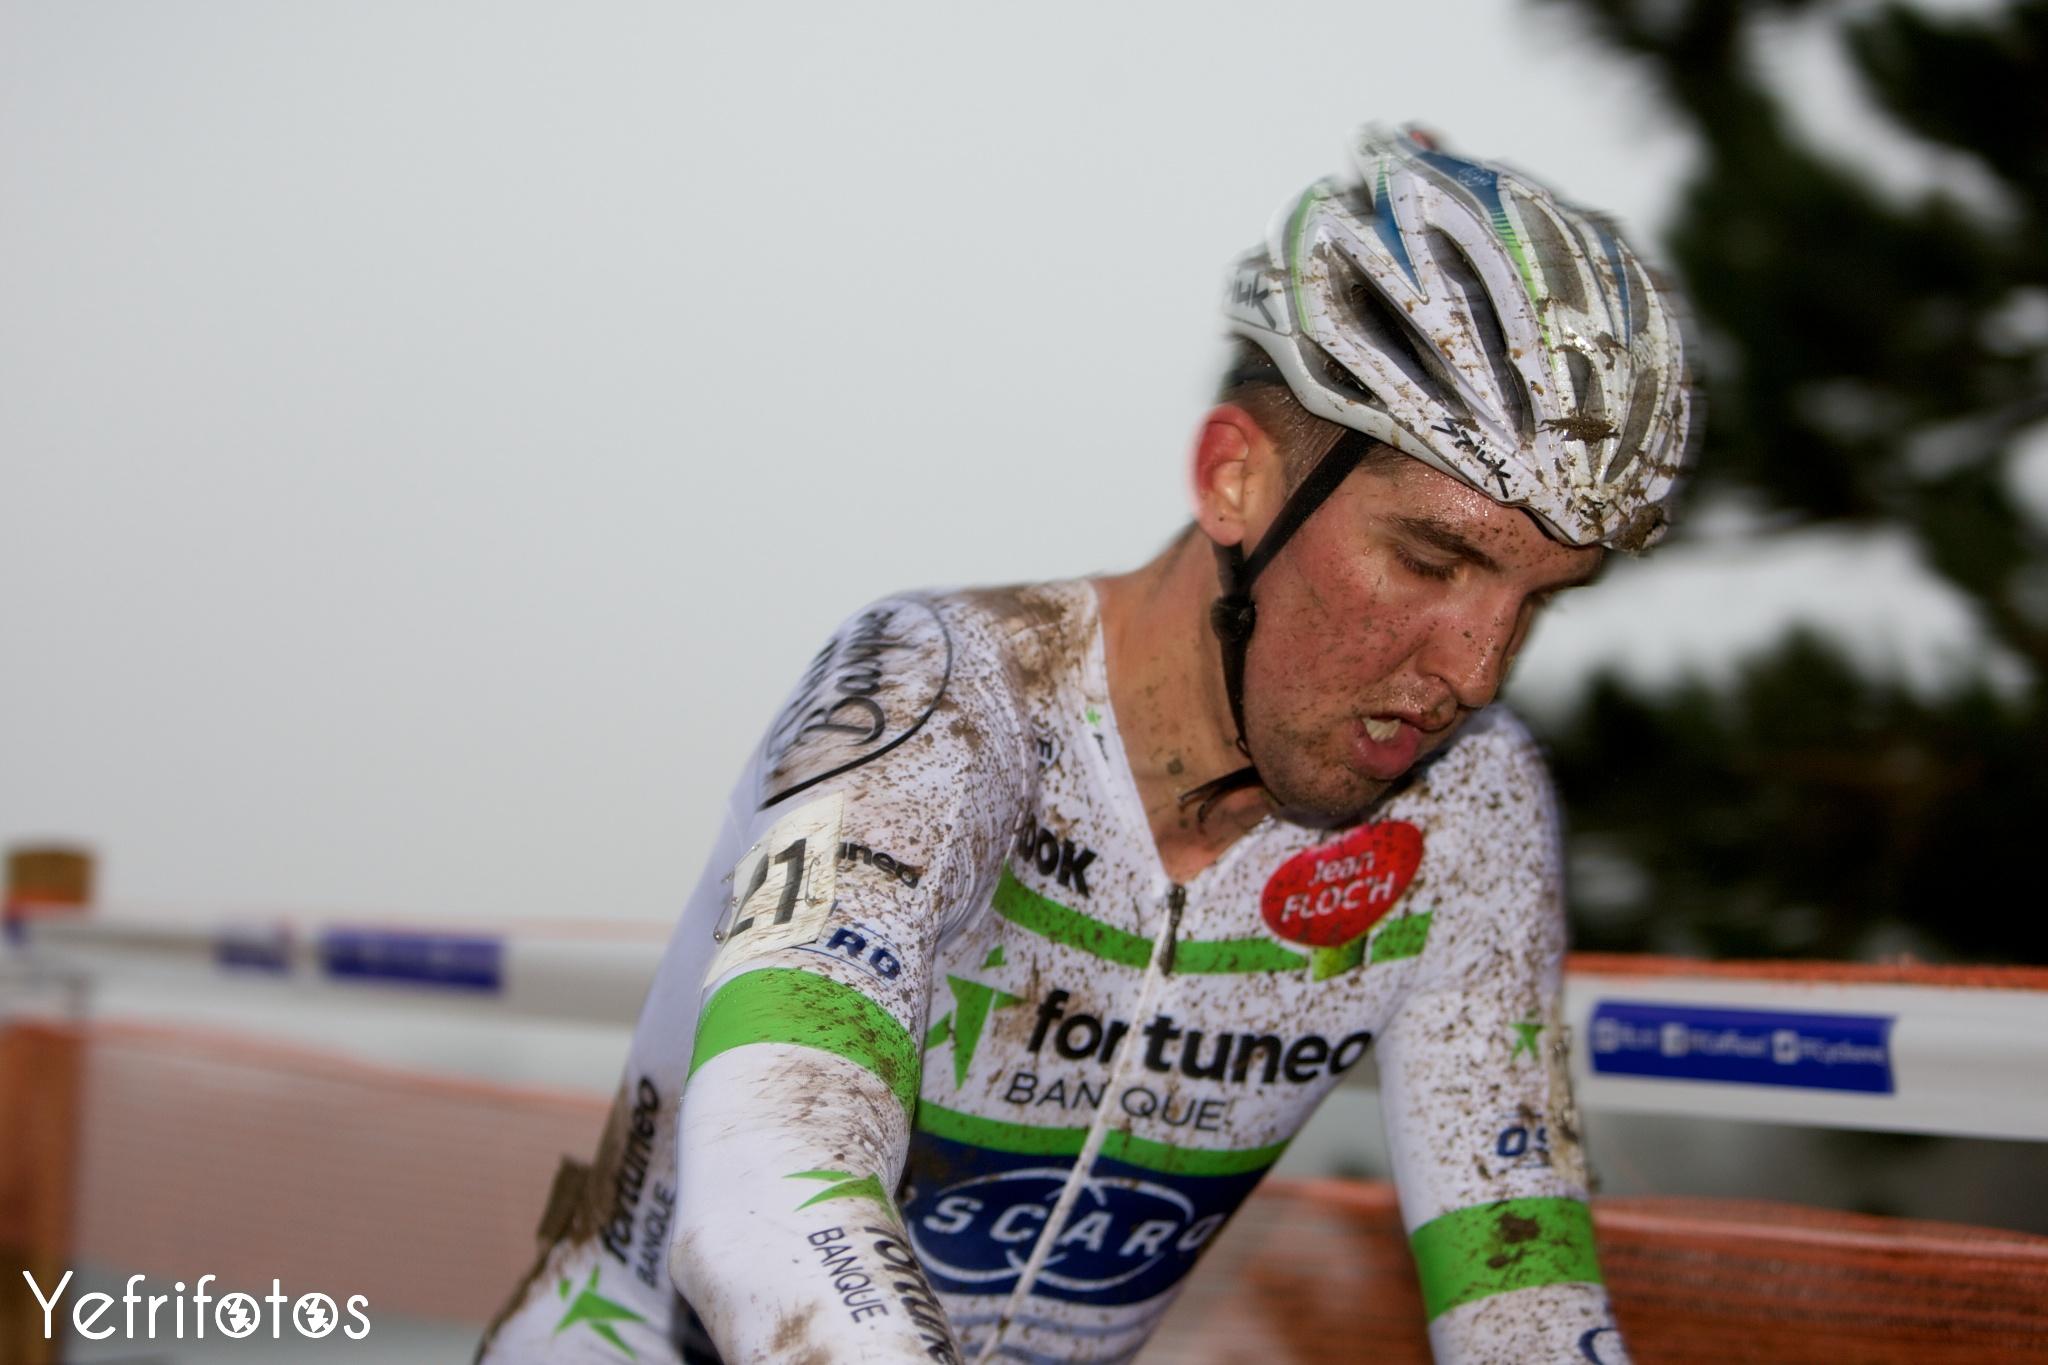 Kevin Ledanois - Team Fortuneo Oscaro - Coupe de France Cyclocross Jablines